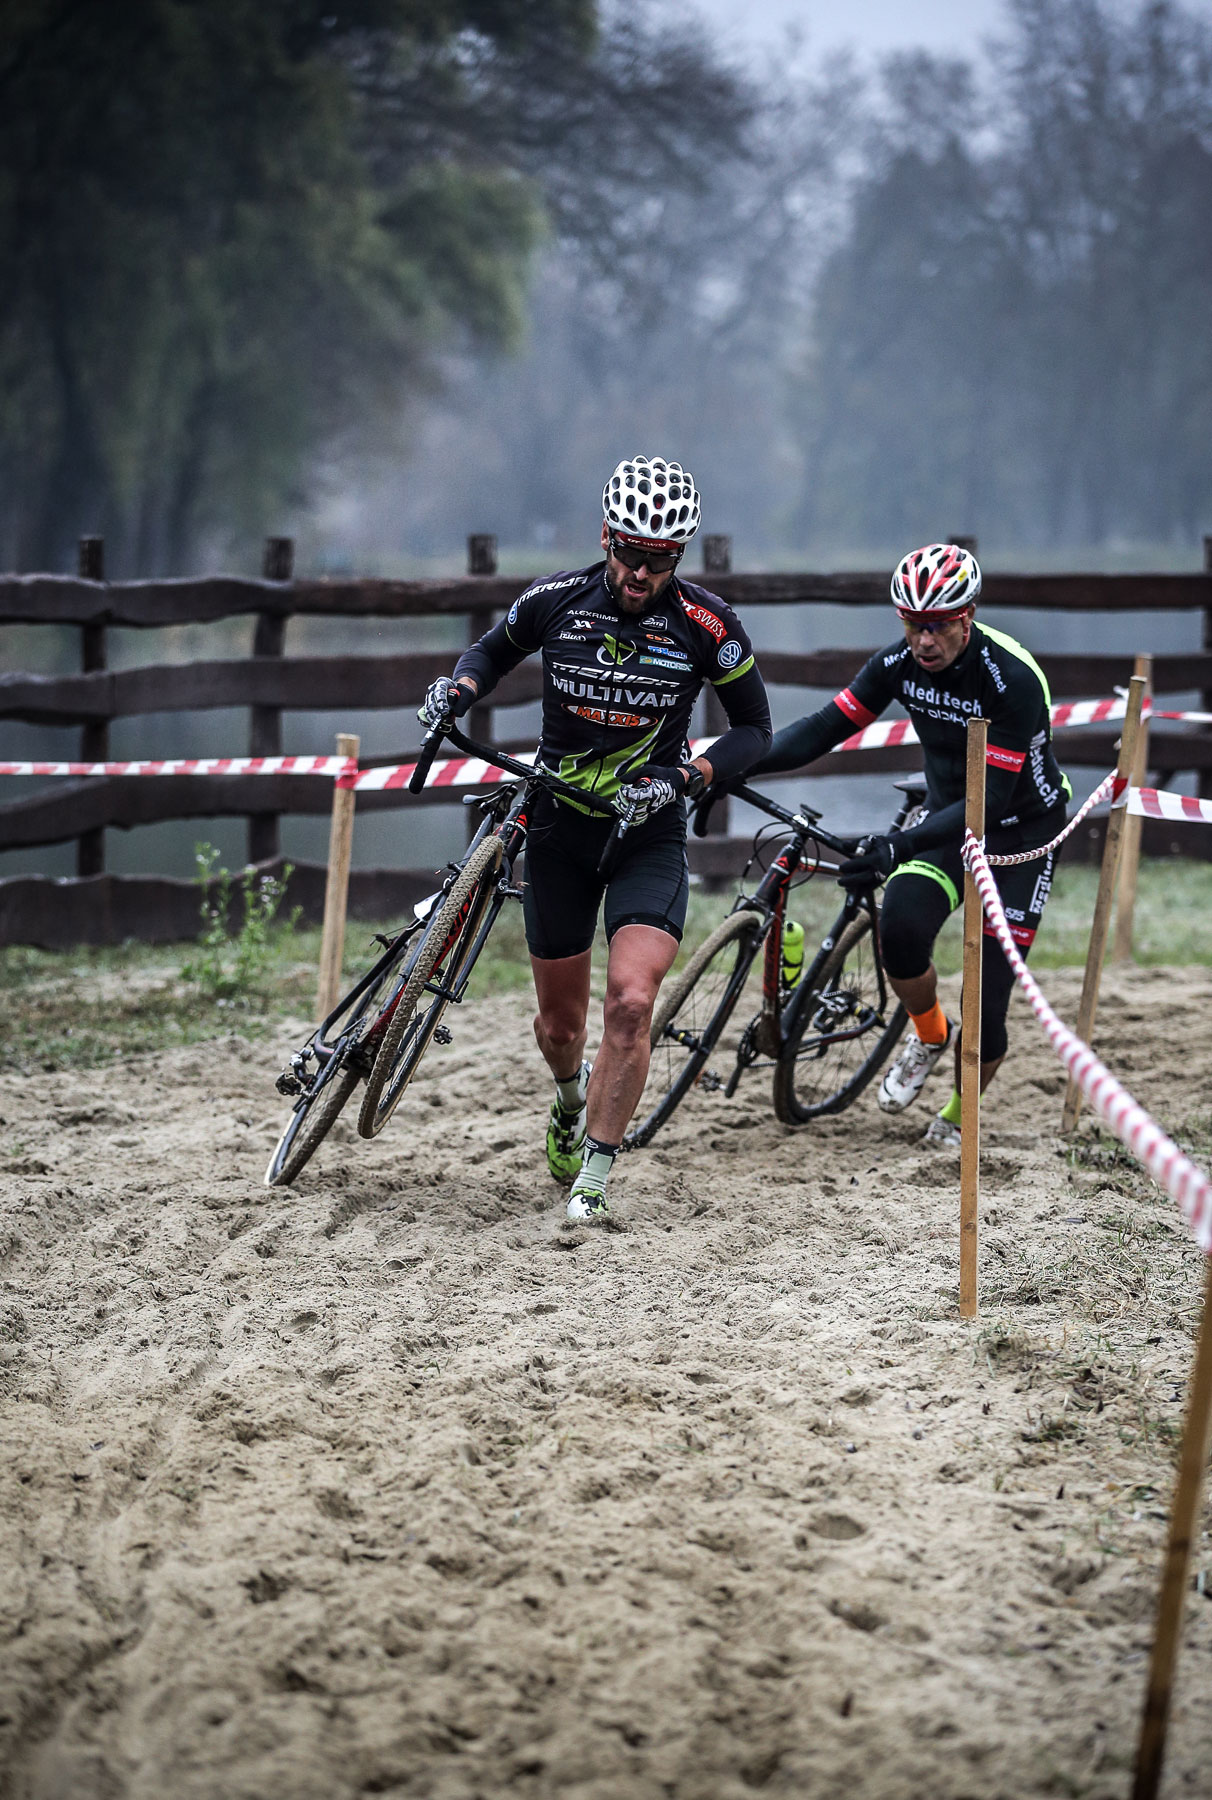 KolorCross Cyclocross Magyar Kupa, Kazincbarcika, homokágy